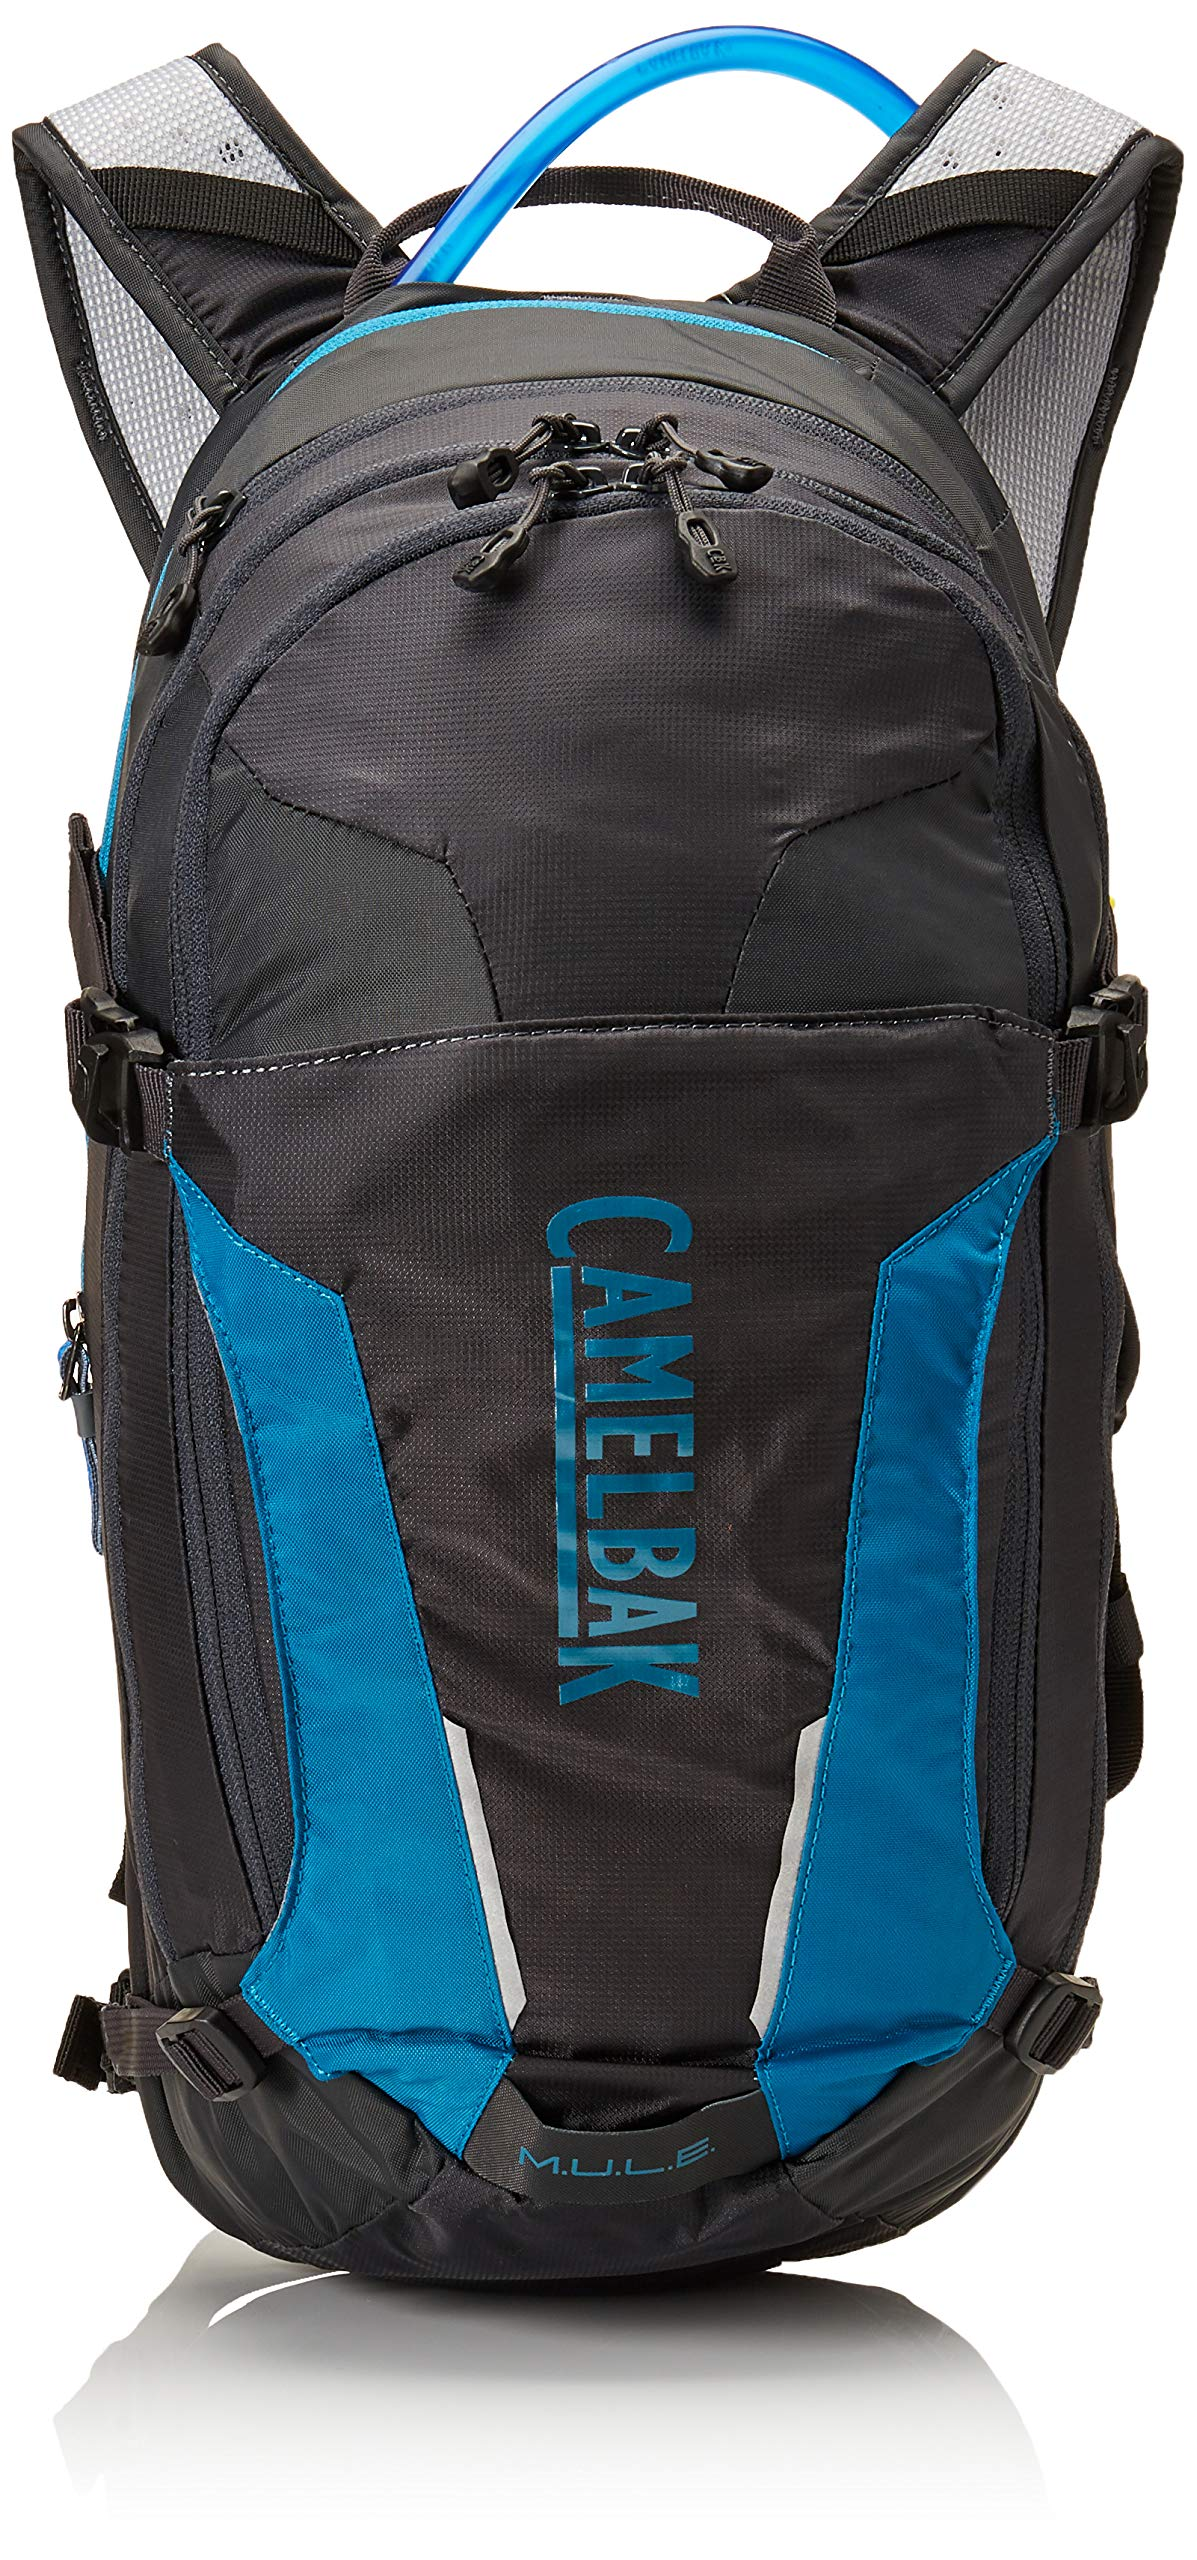 CamelBak M.U.L.E. 100 oz Hydration Pack, Charcoal/Teal